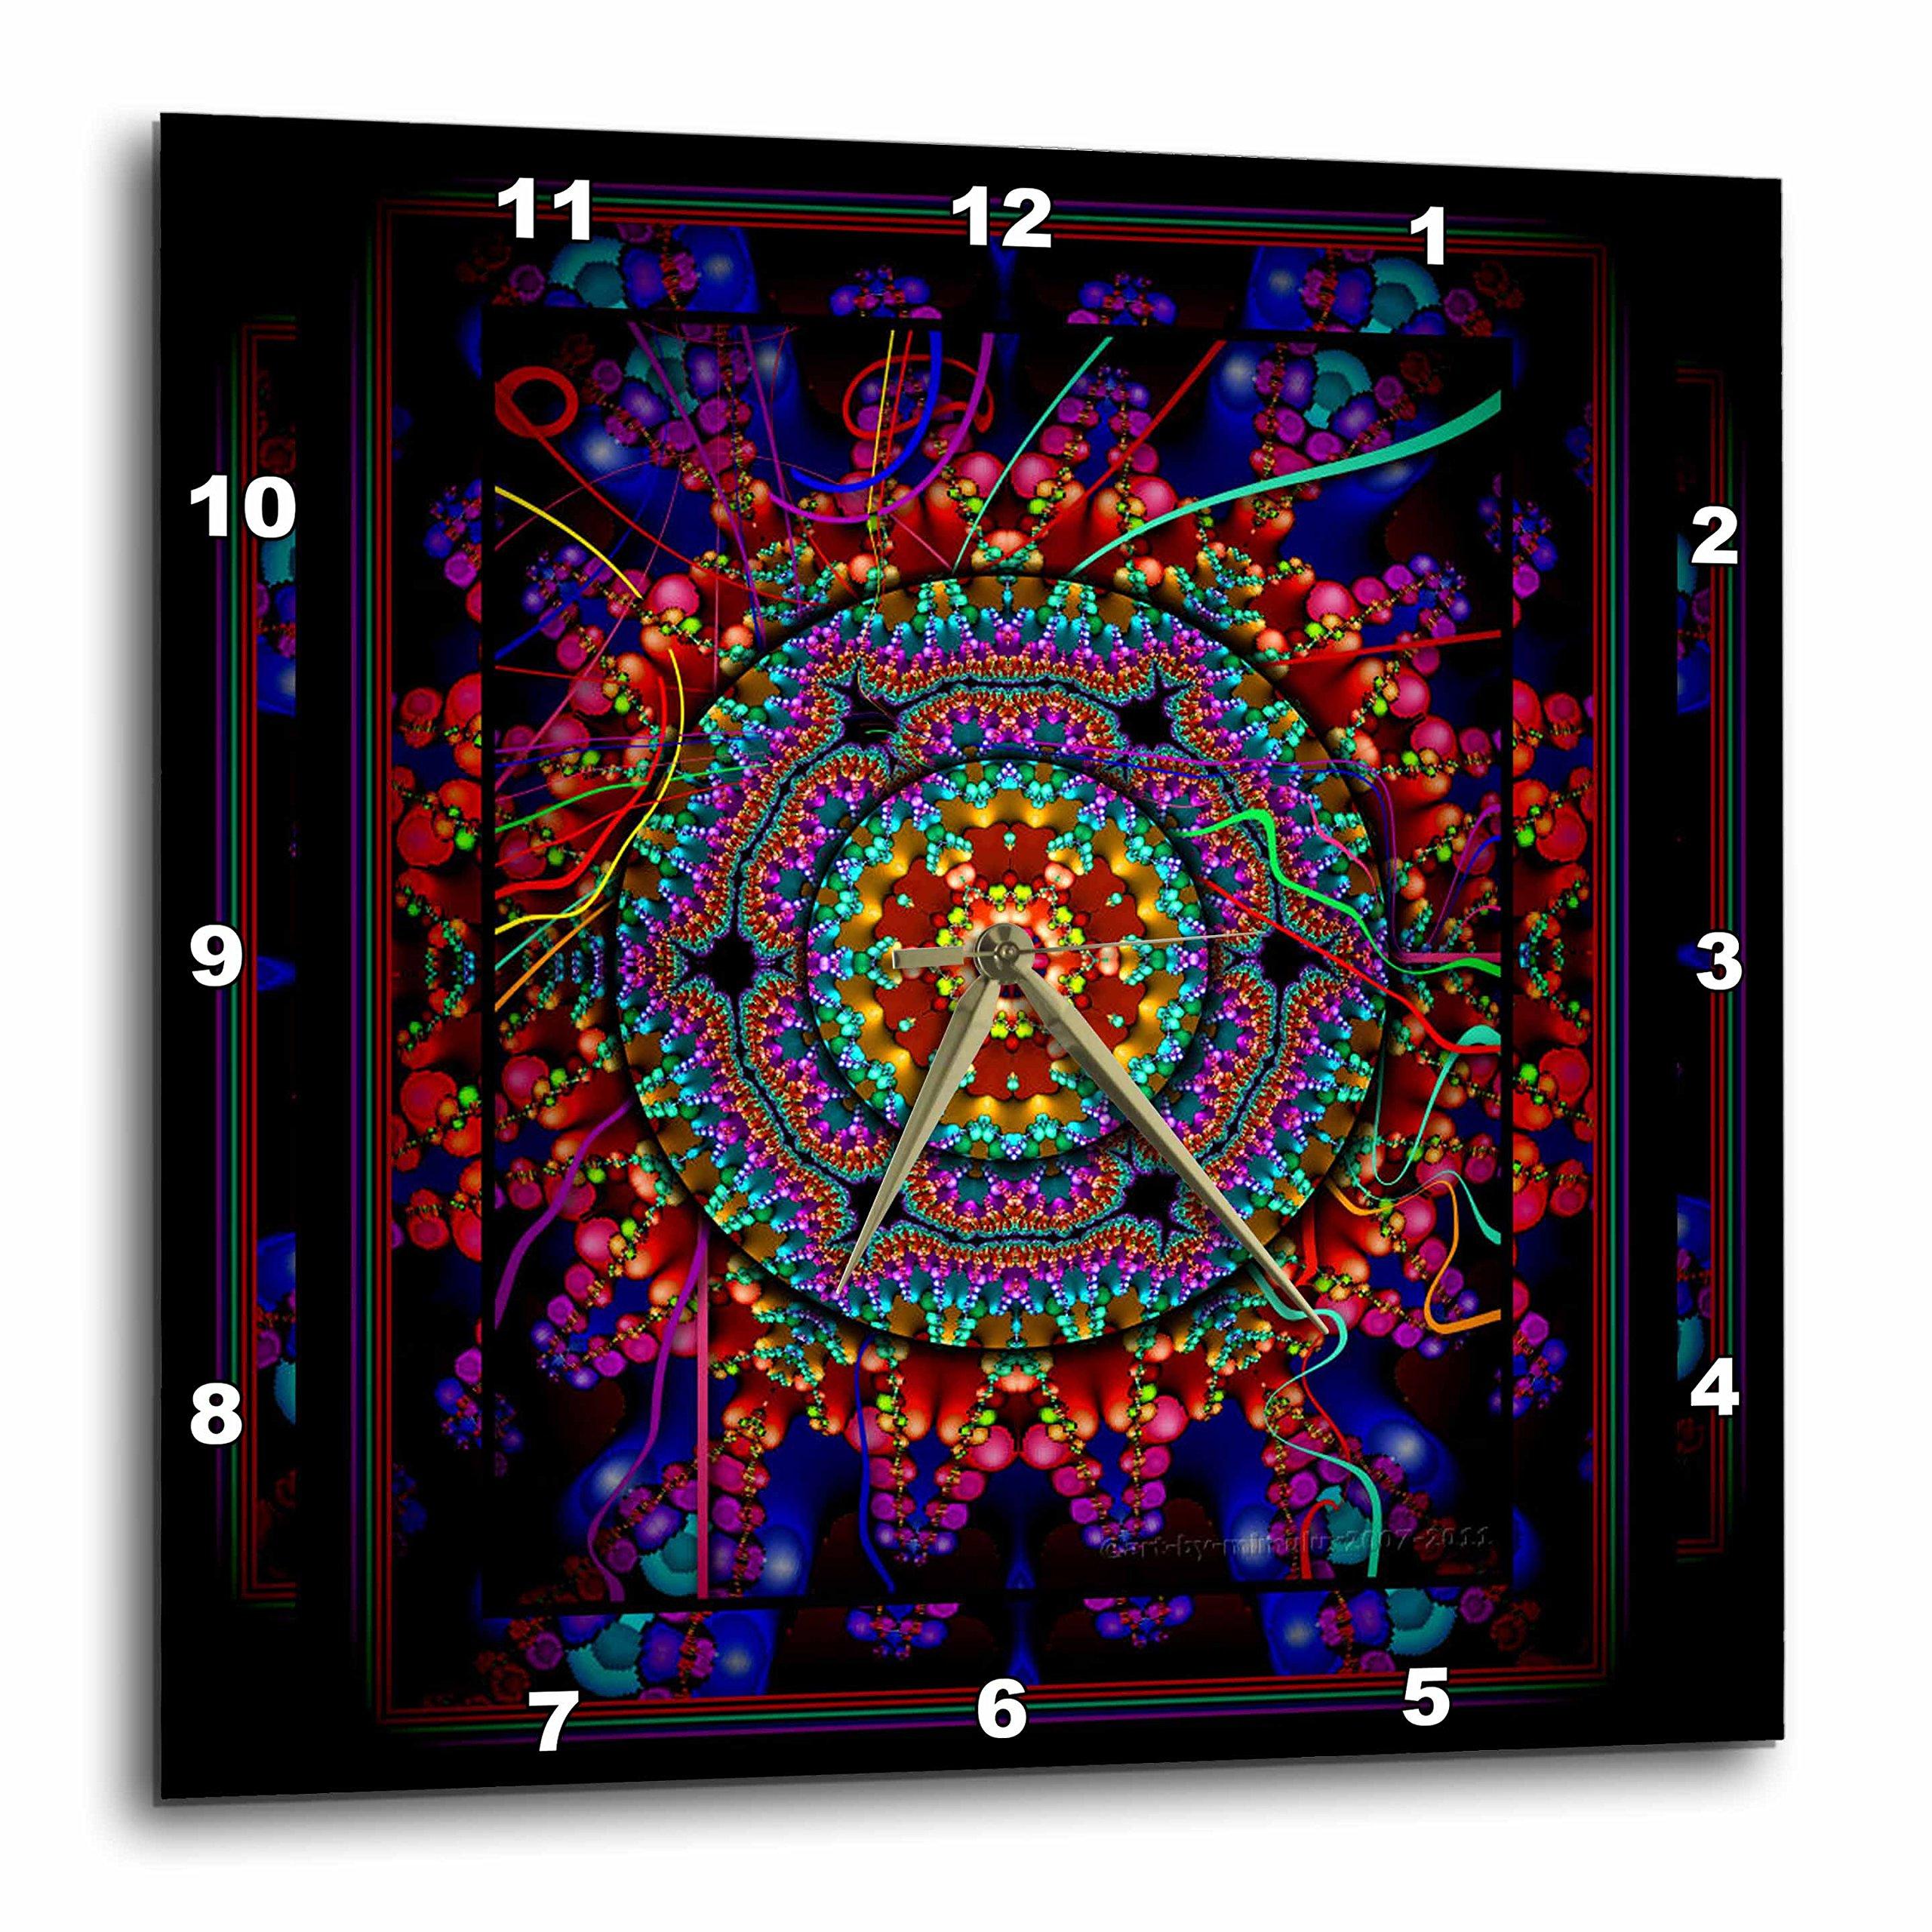 3dRose dpp_24832_2 Mandala 4 Mandala India Buddhism Hinduism Psychedellic New Age Harmony Balance Meditation Wall Clock, 13 x 13